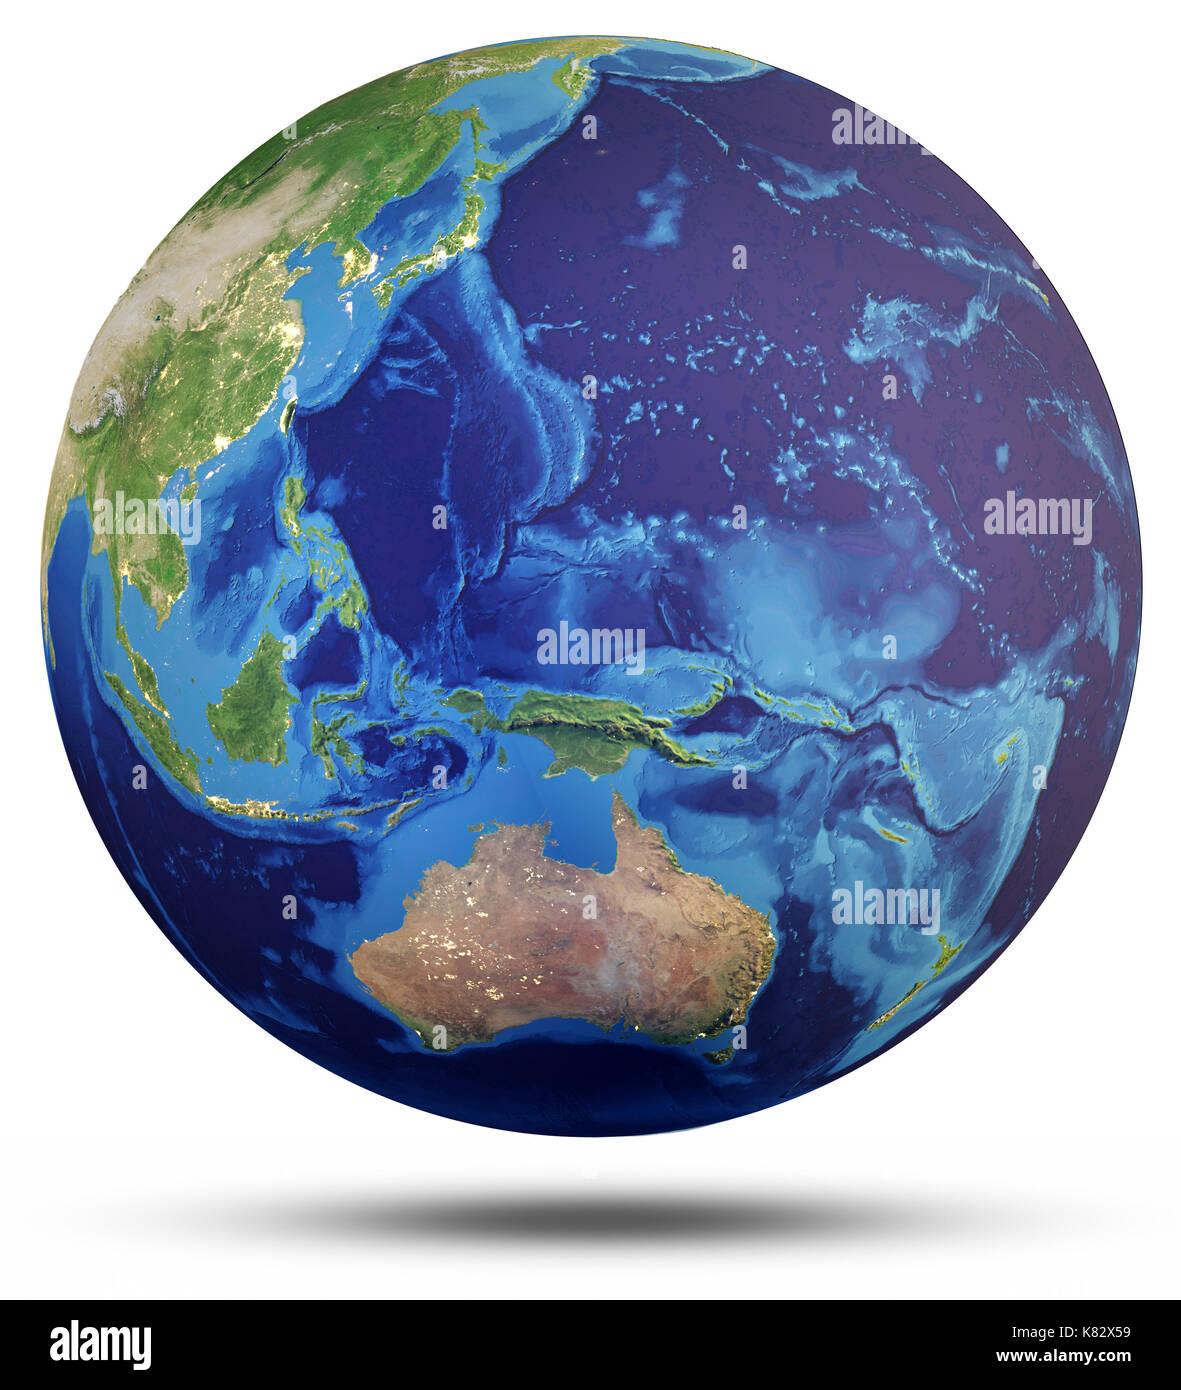 La planète terre monde rendu 3D globe Photo Stock